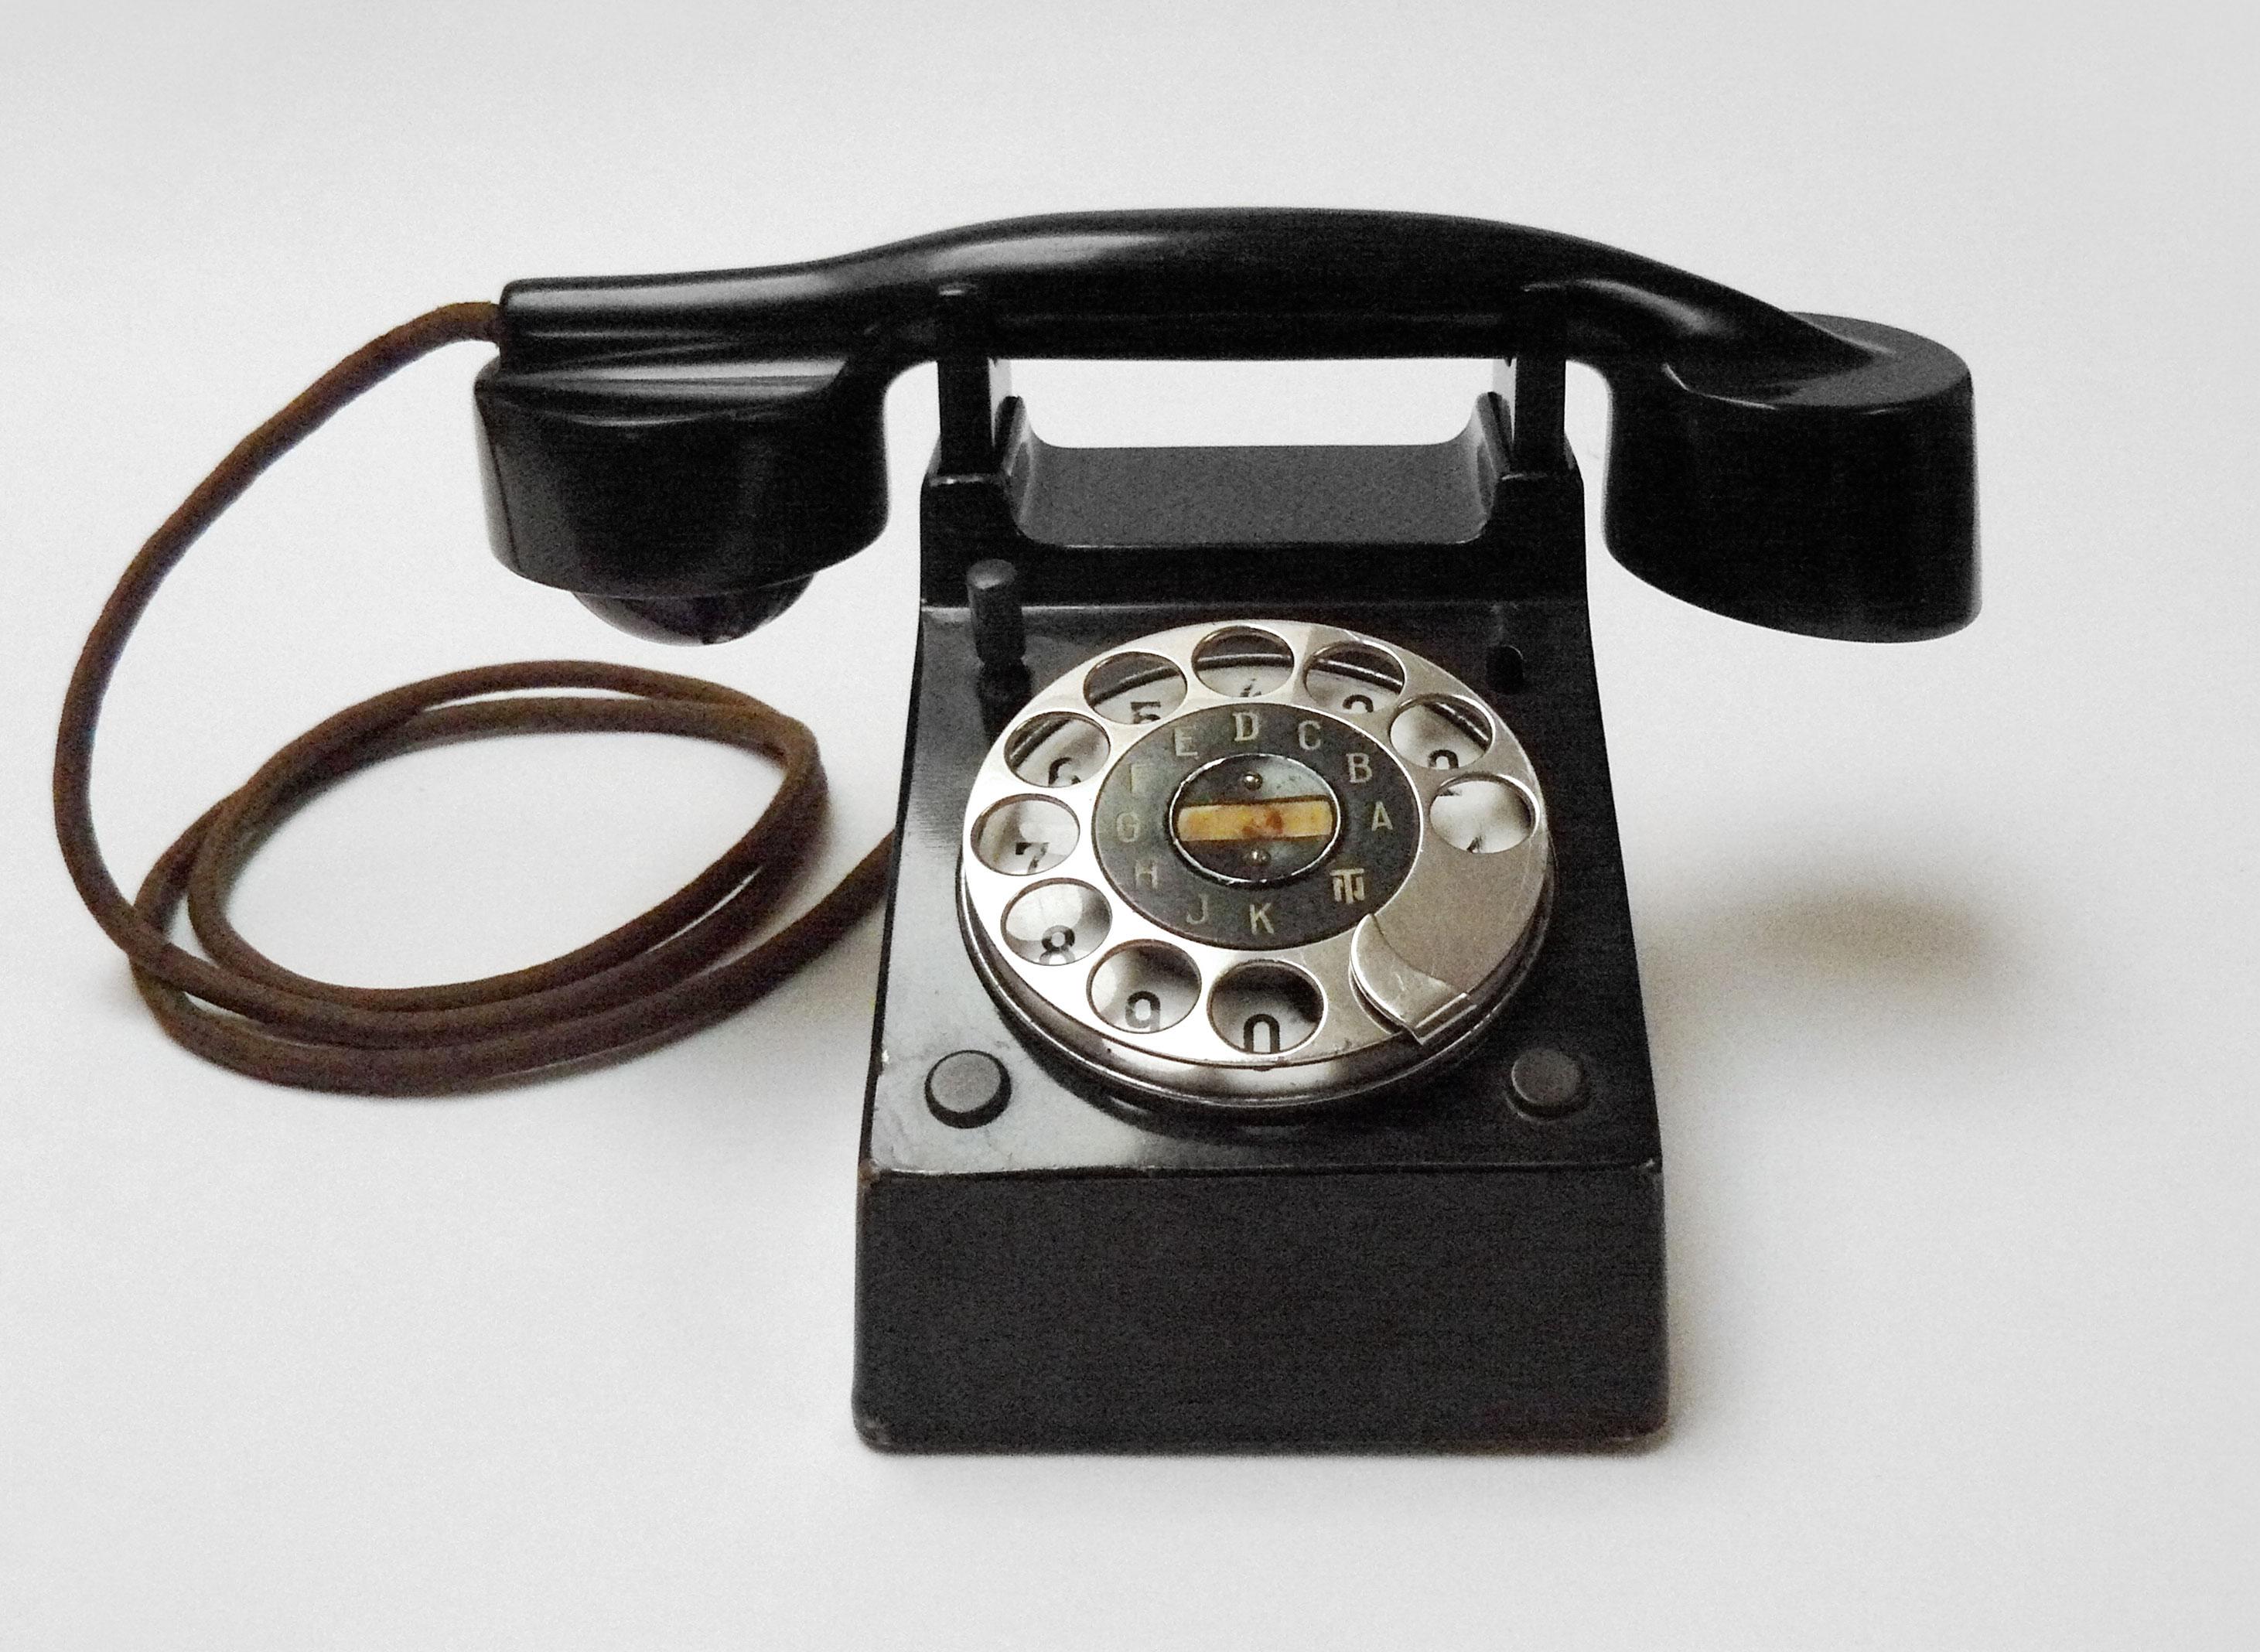 "Bauhaus""- telephone, Fuld & Co, Frankfurt, Germany, 1928. – DESIGN20.eu"